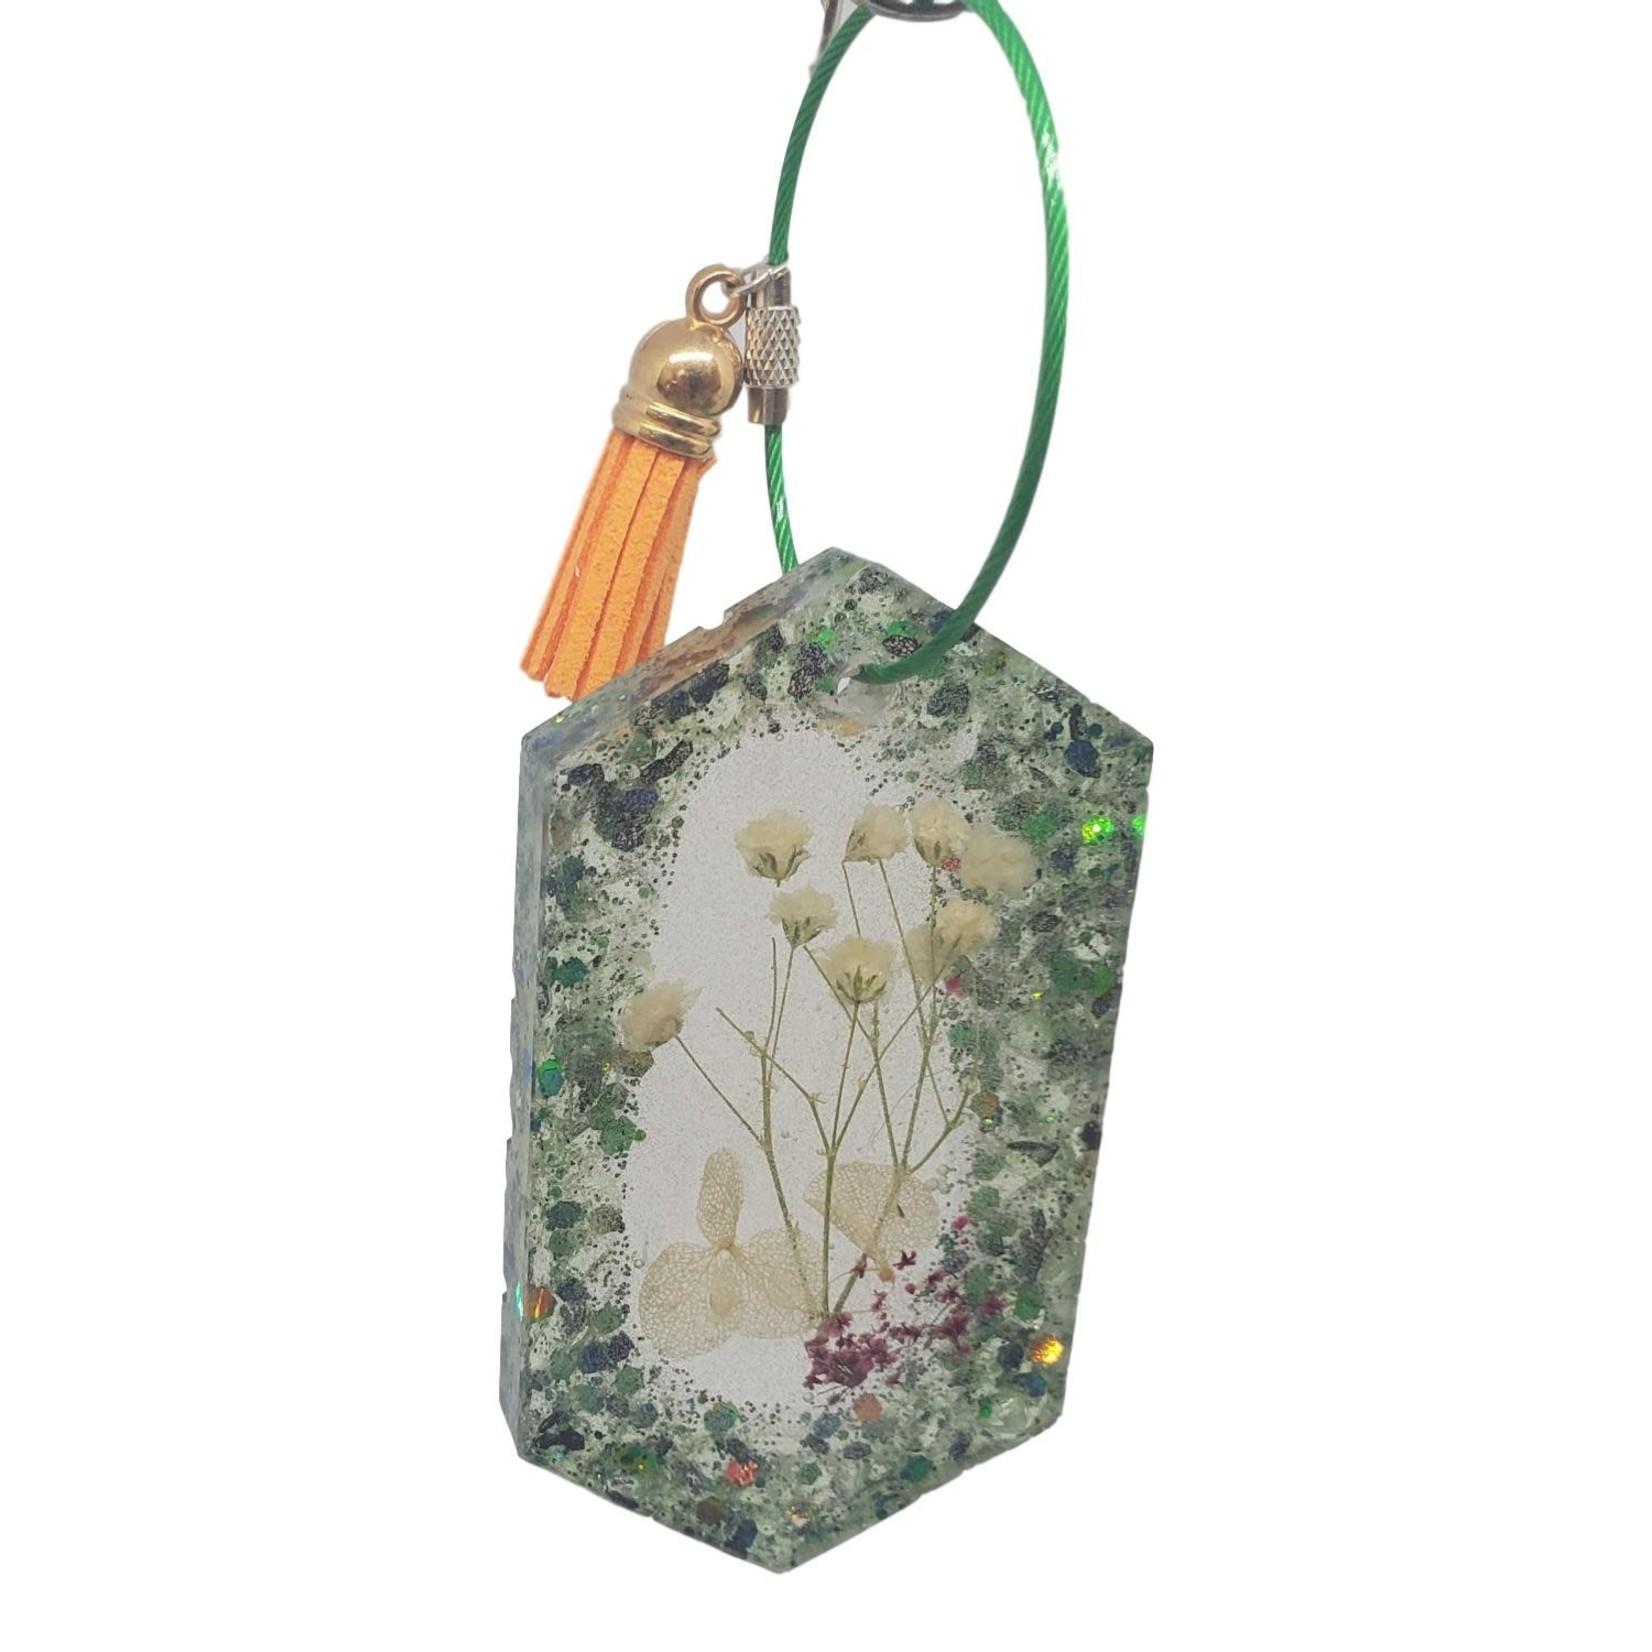 East Coast Sirens Dried Flowers Set In Key Chain/Luggage Tag